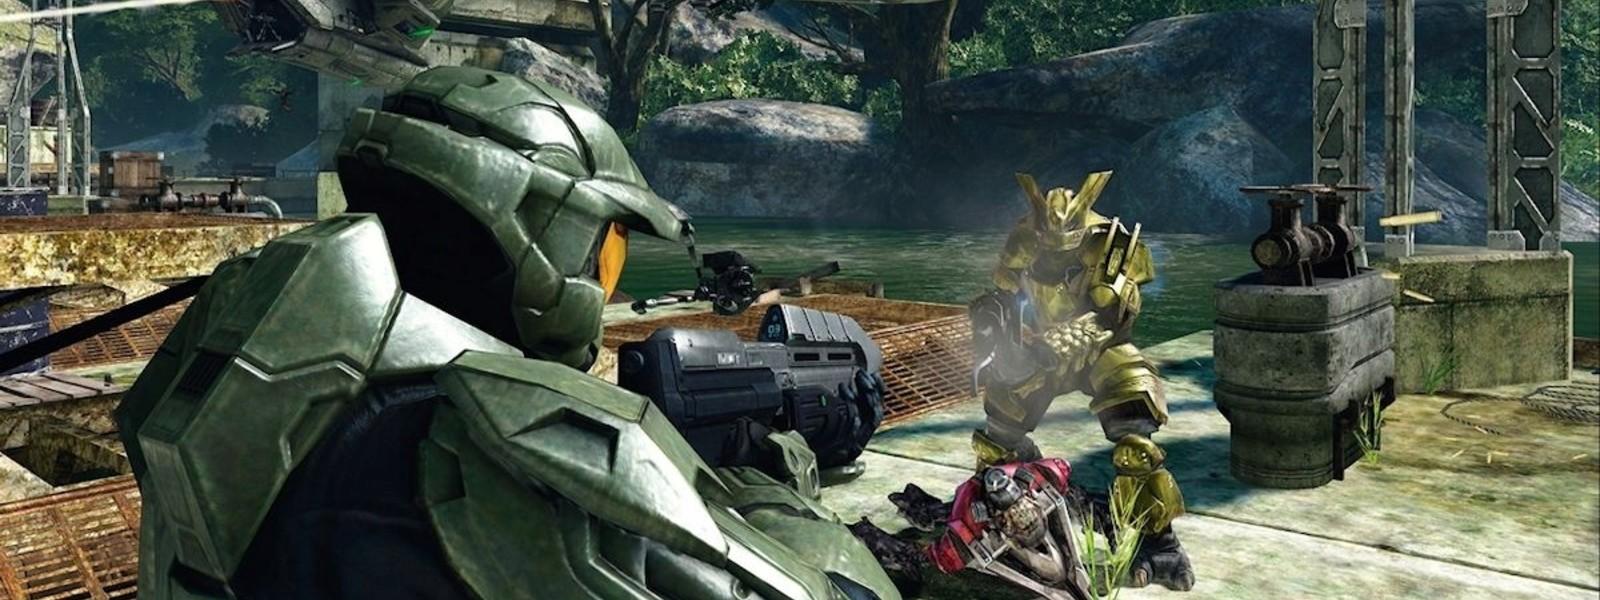 Halo 3 Premiera Na Allegro Pl